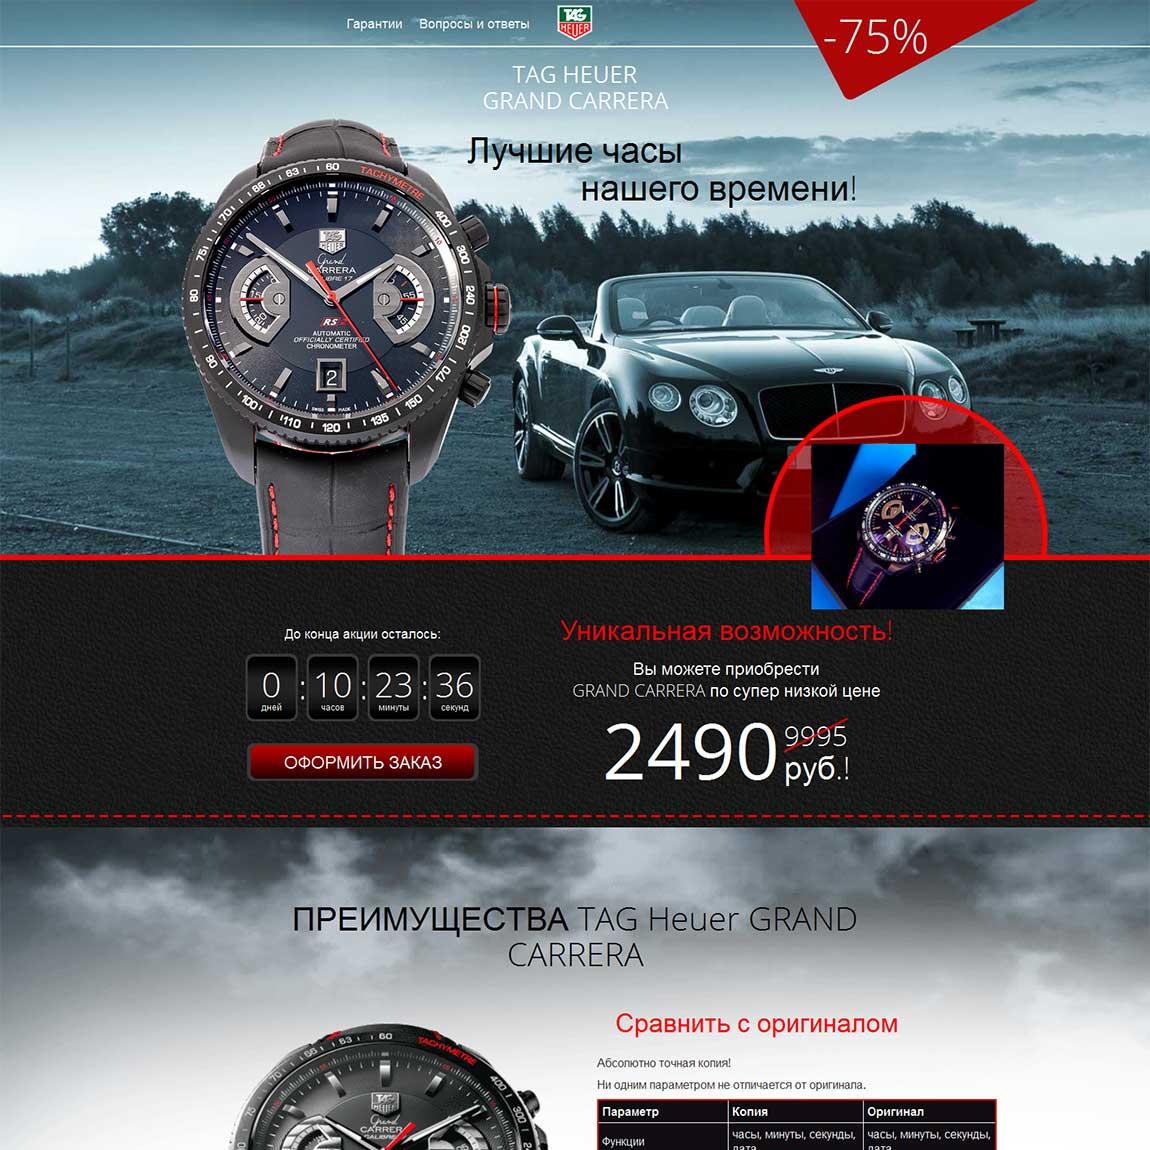 Миниатюра Лендинга Часы Tag Heuer Grand Carrera 001